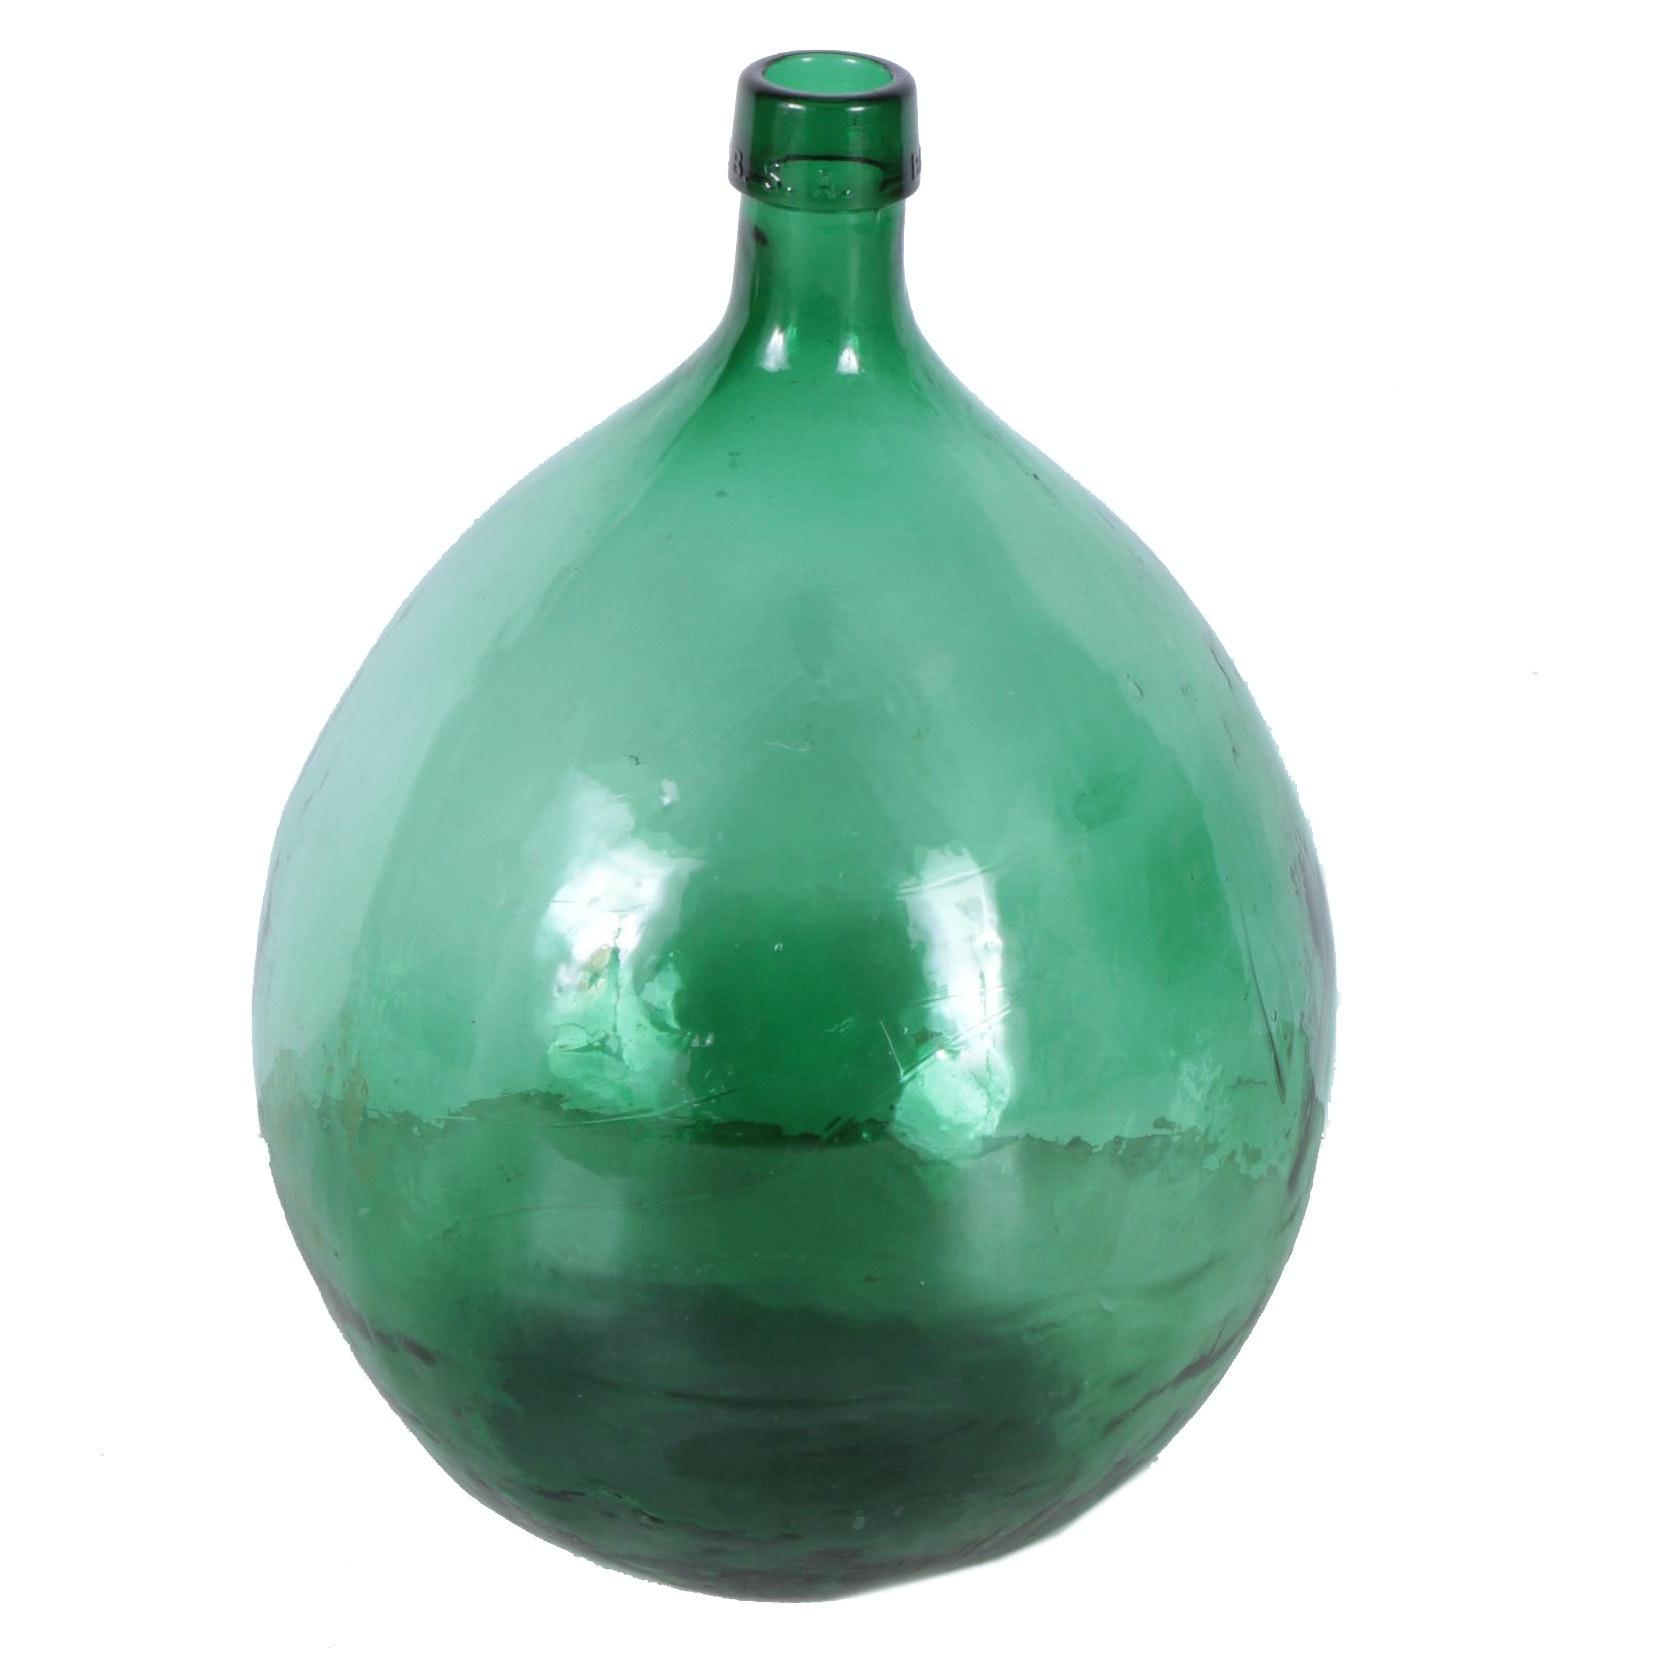 Vintage Spanish Glass Demijohn Wine Jug